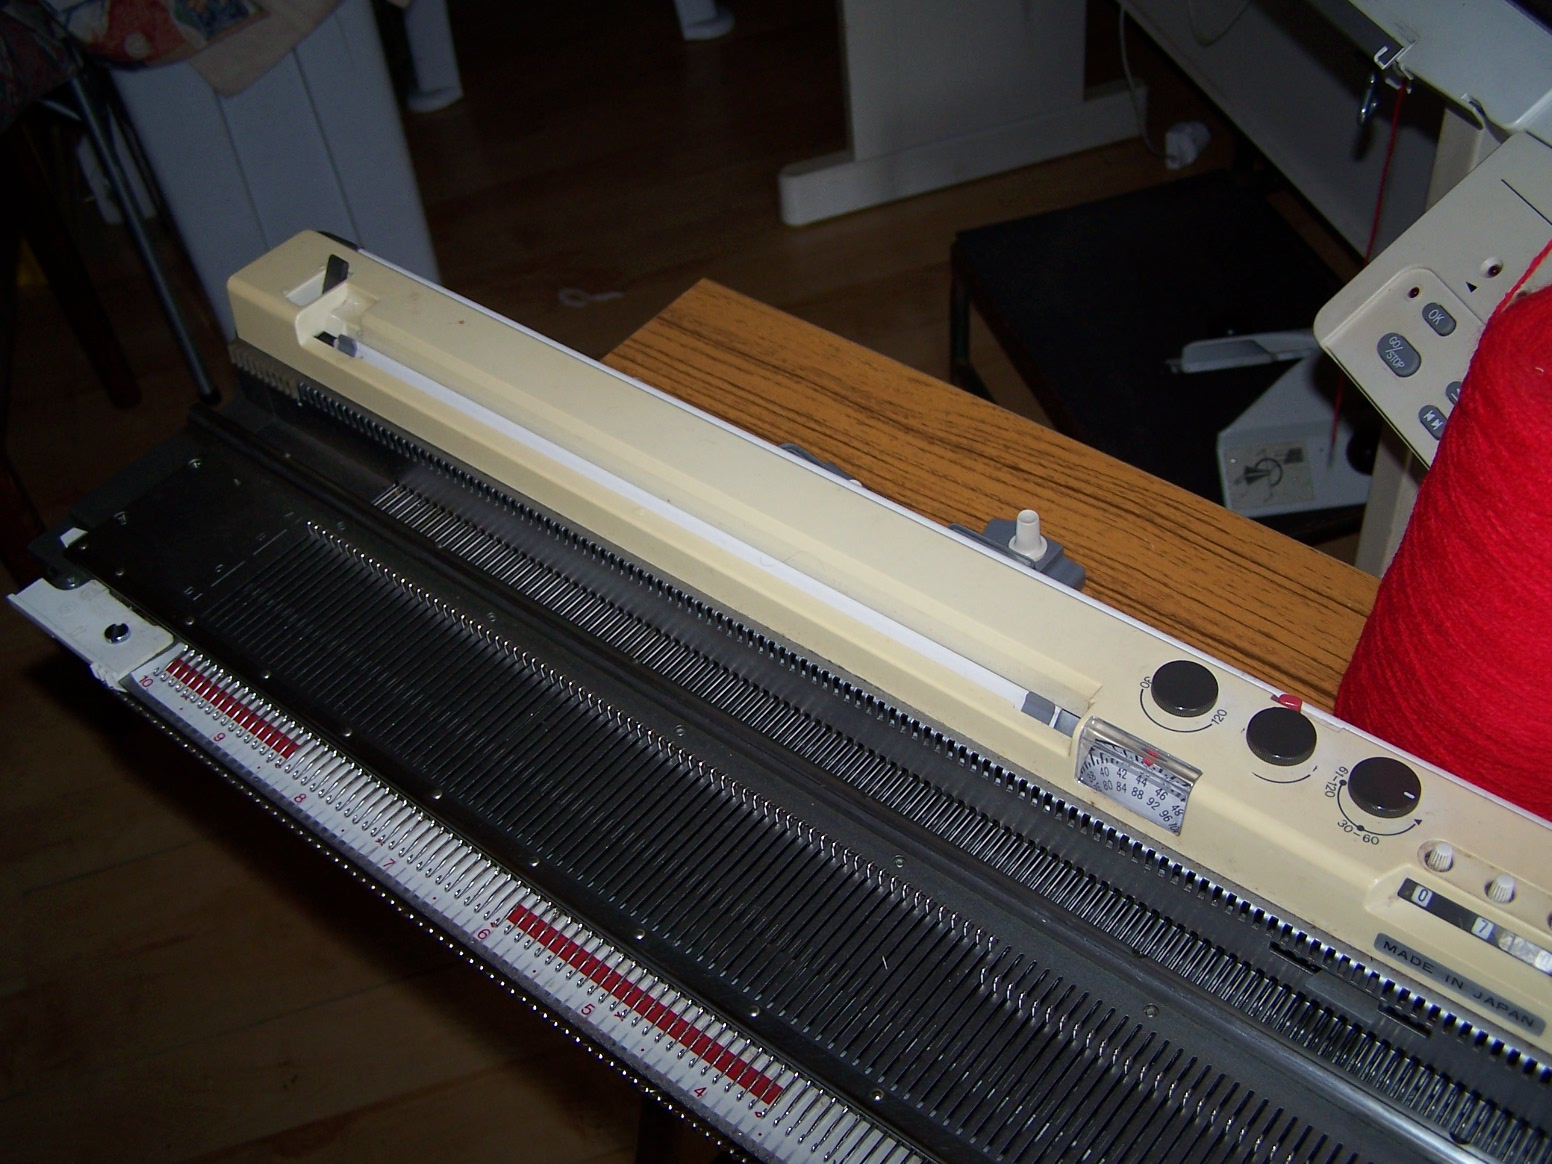 Knitmaster 700 with knitradar